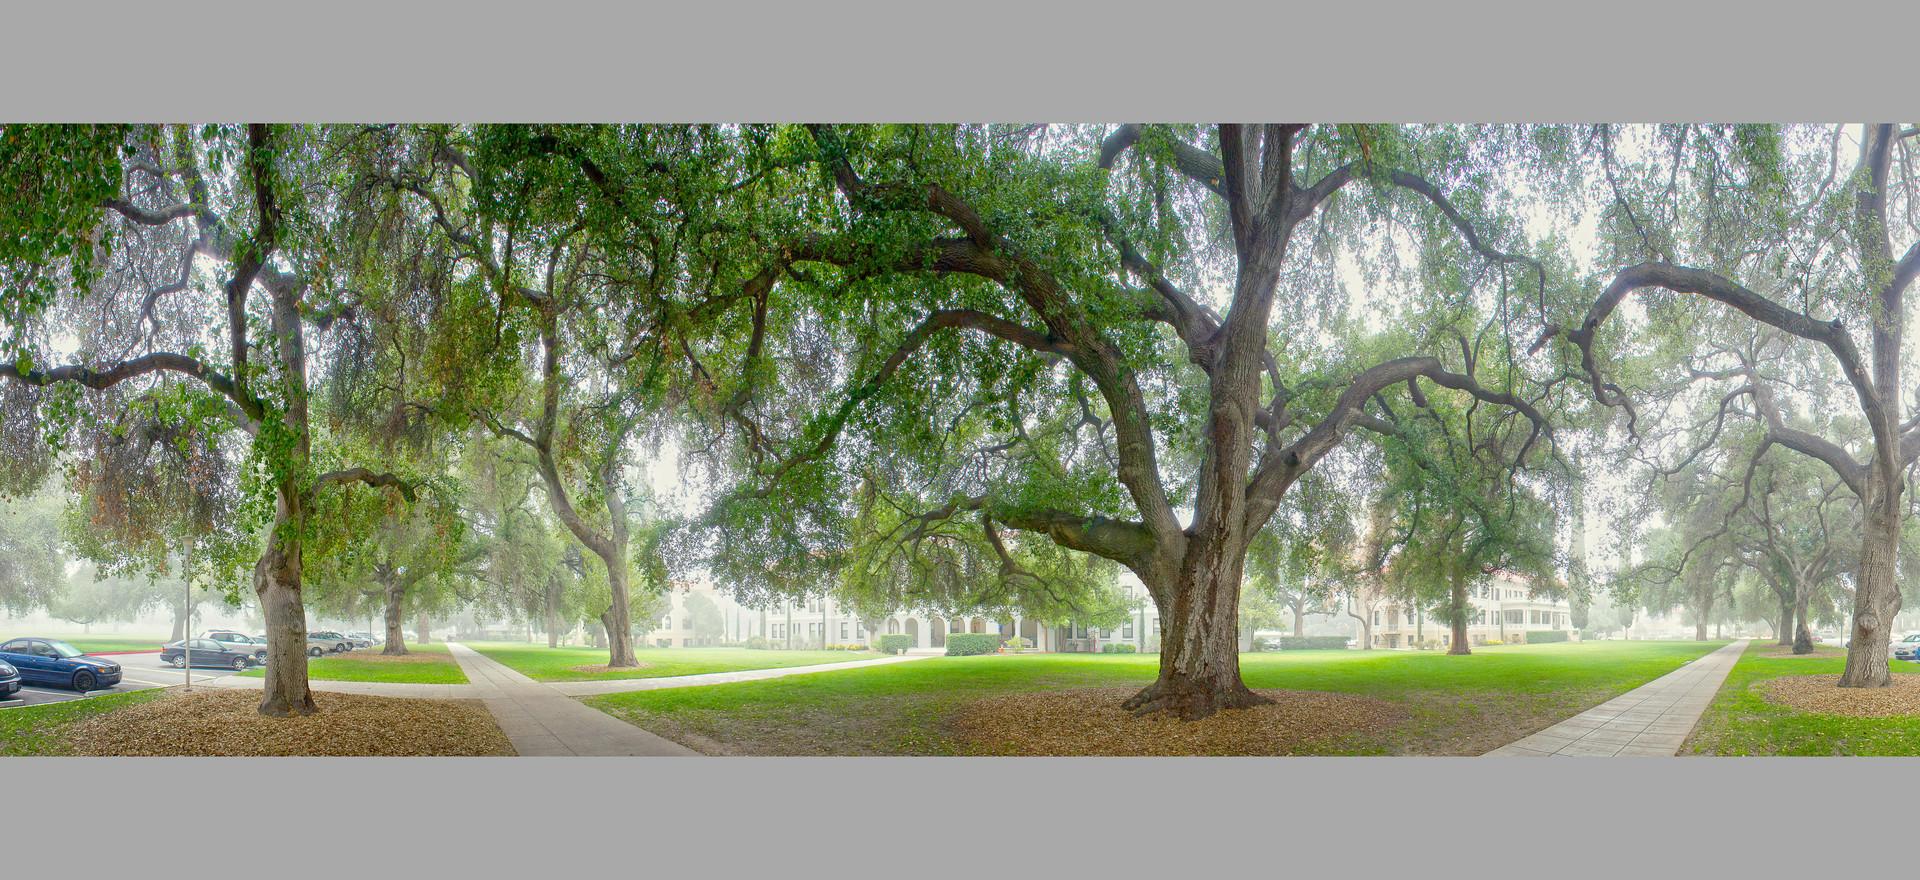 Oak Trees in Fog, U of R, Redlands